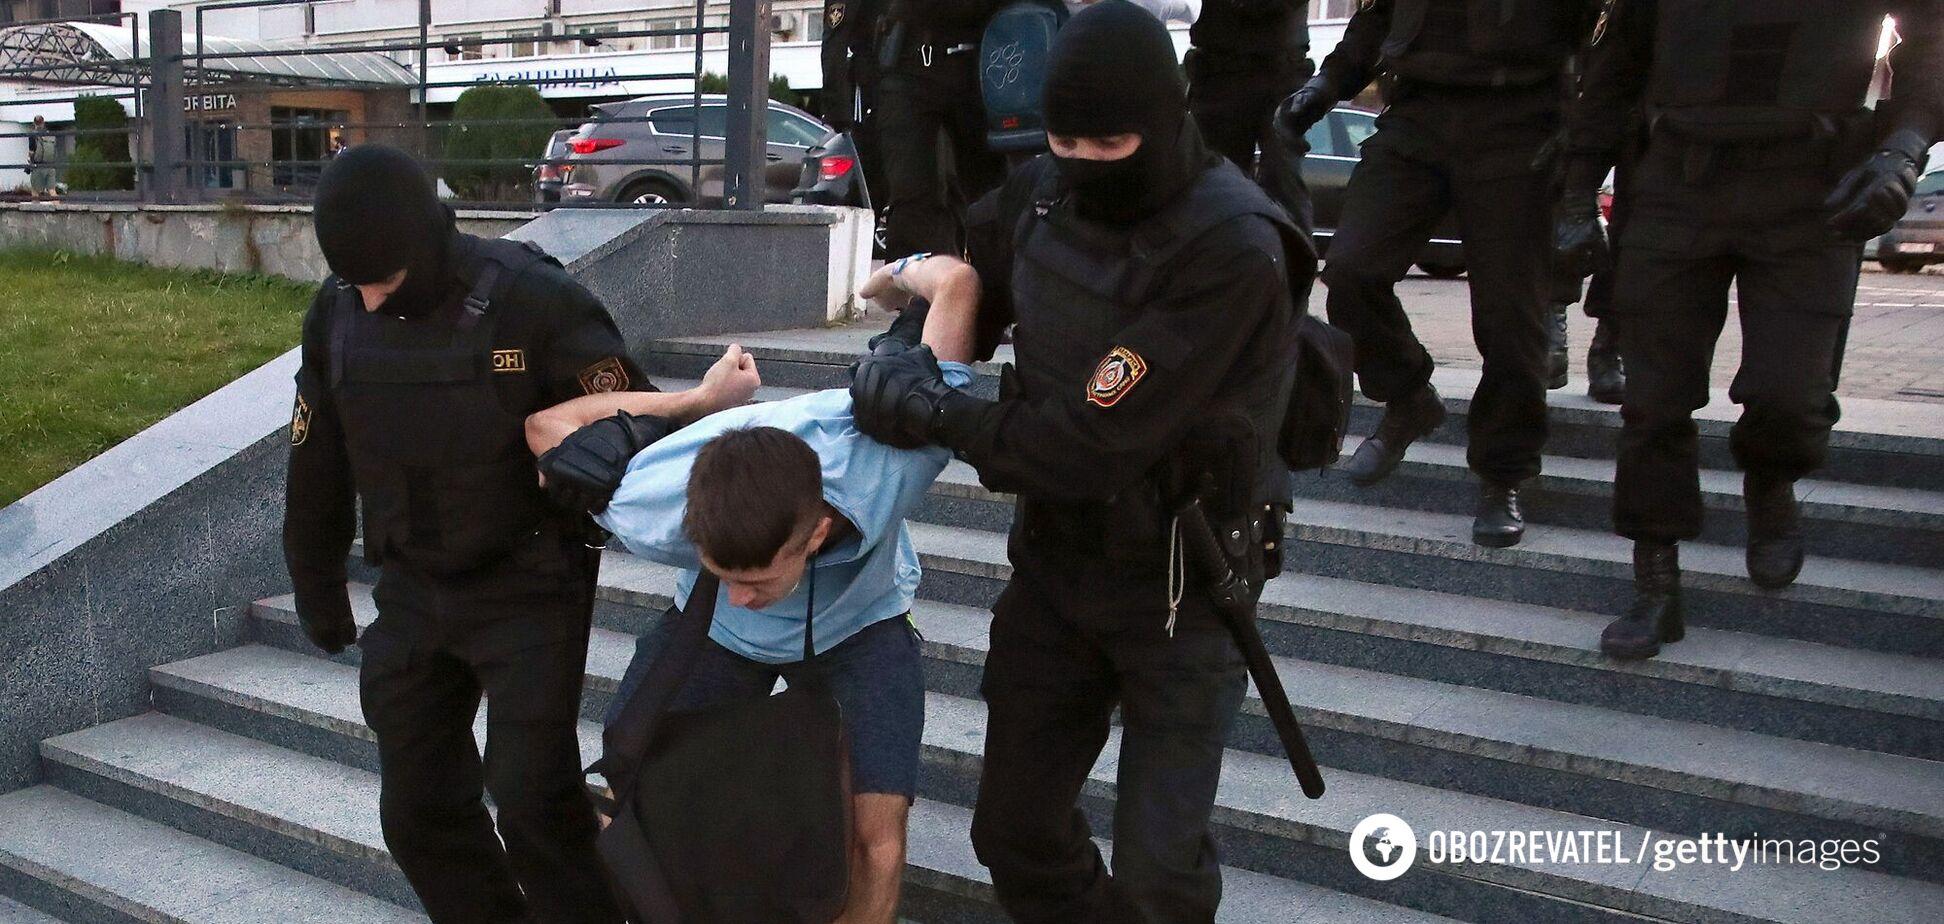 В Беларуси задержали и судили глухонемого парня. Иллюстрация